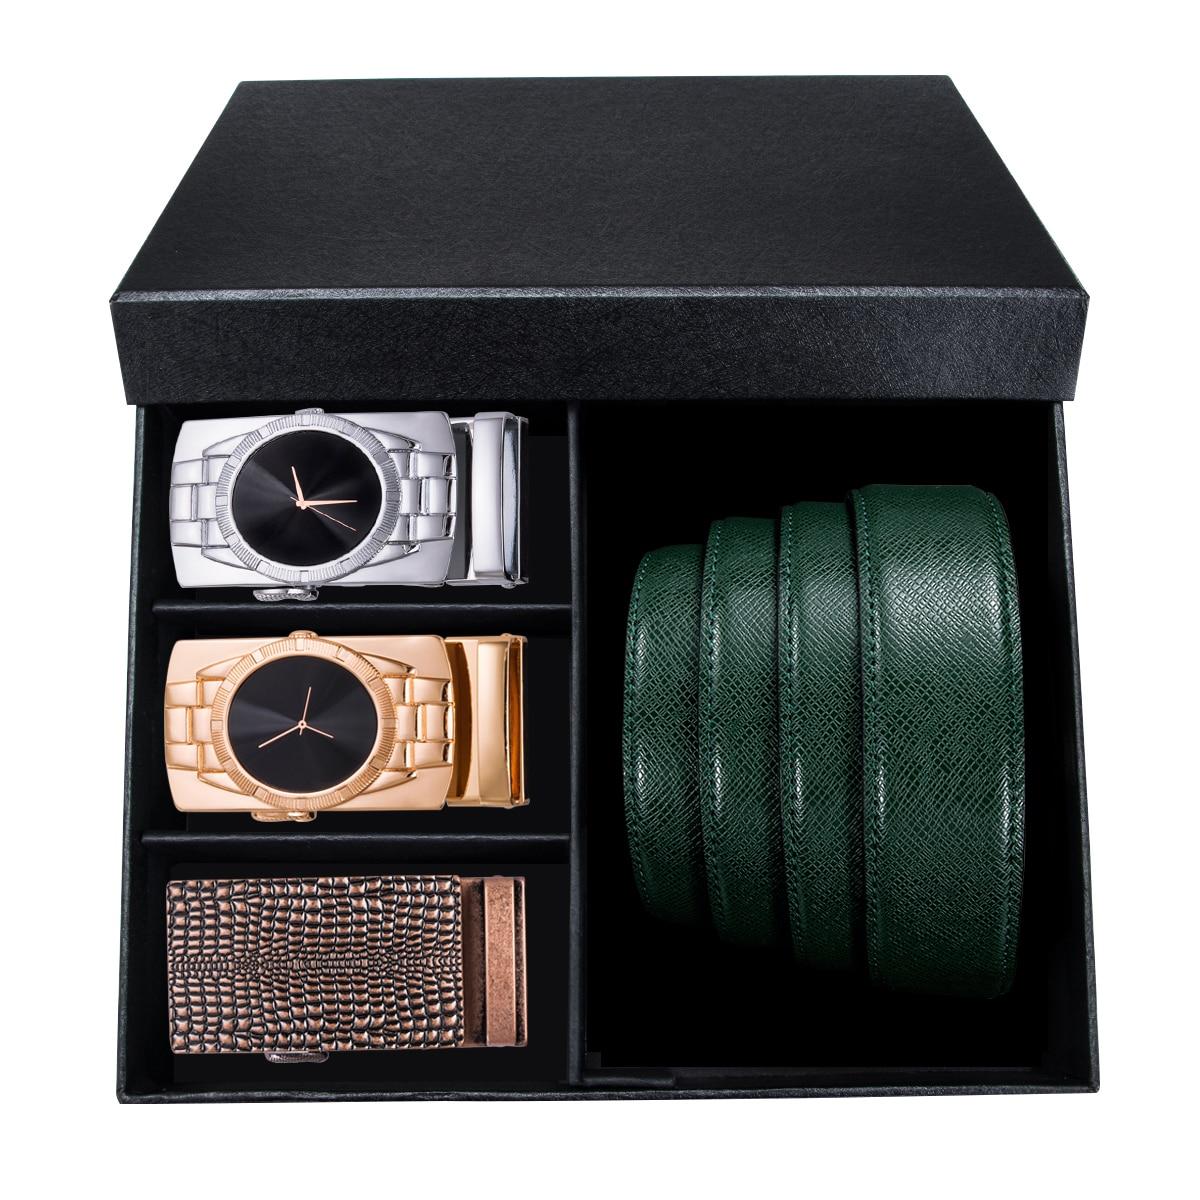 Barry.Wang Fashion Designers Men Belt 110-130cm Cowhide Leather Green Strap 3PCS Automatic Buckle Belt For Men Gift Box Set GB-4